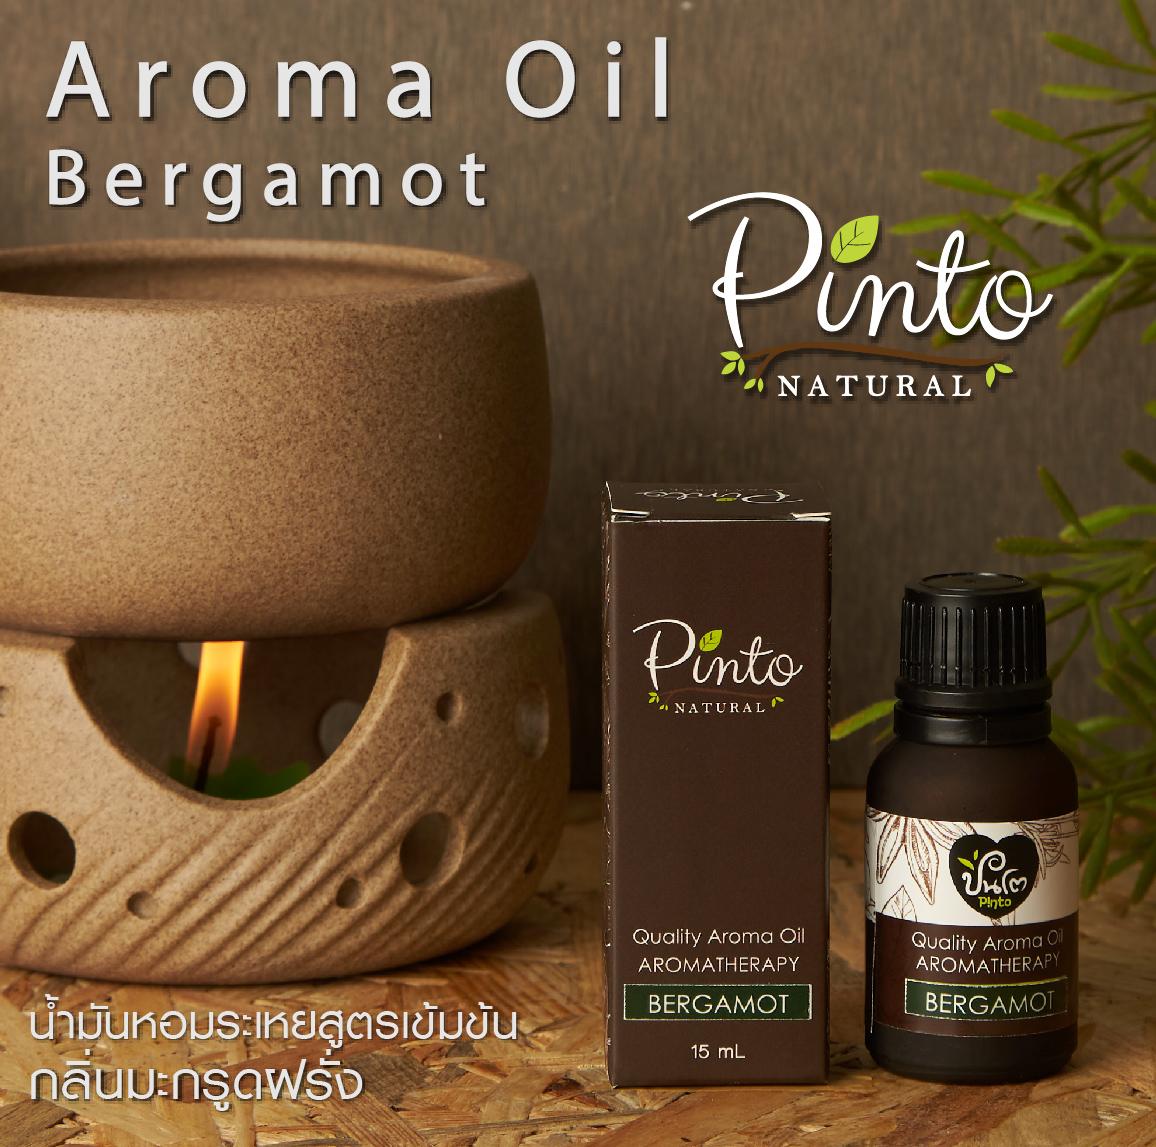 AROMA OIL - น้ำหอมสำหรับจุดเตาตะเกียง